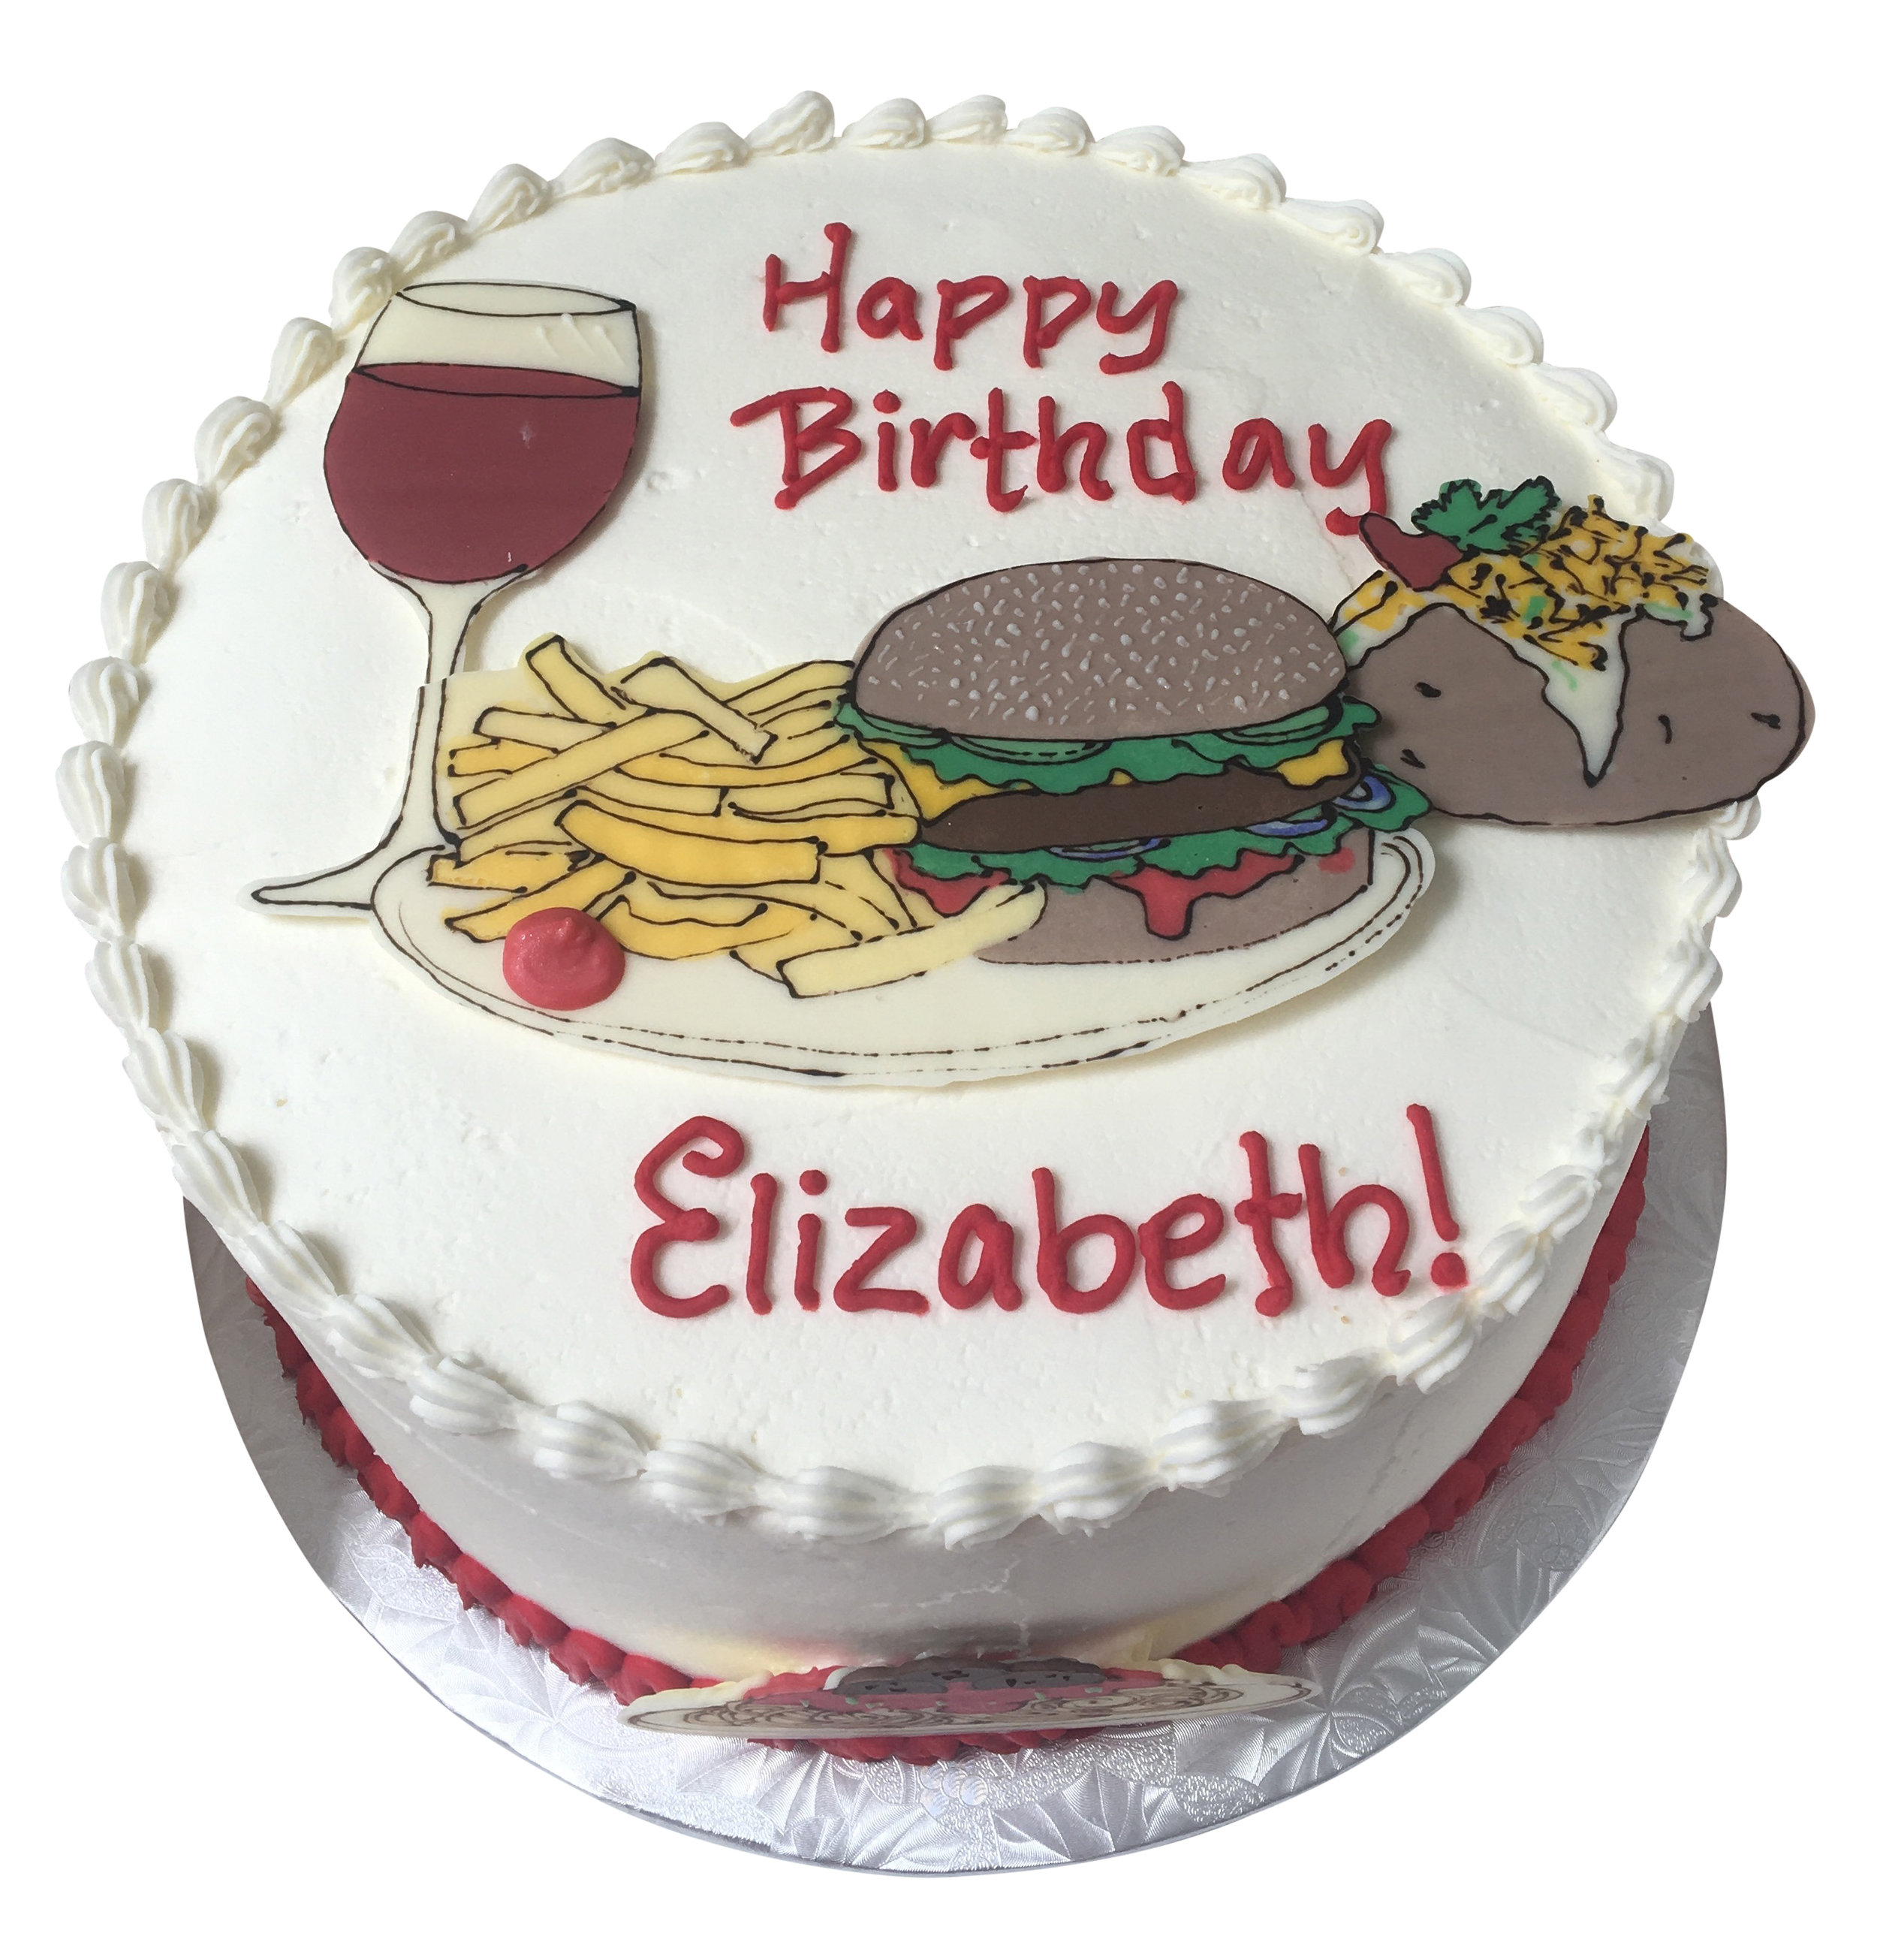 BeBe-Cakes-Wine-Fries-Burger-Bakes-Potatoe-Cake.JPG